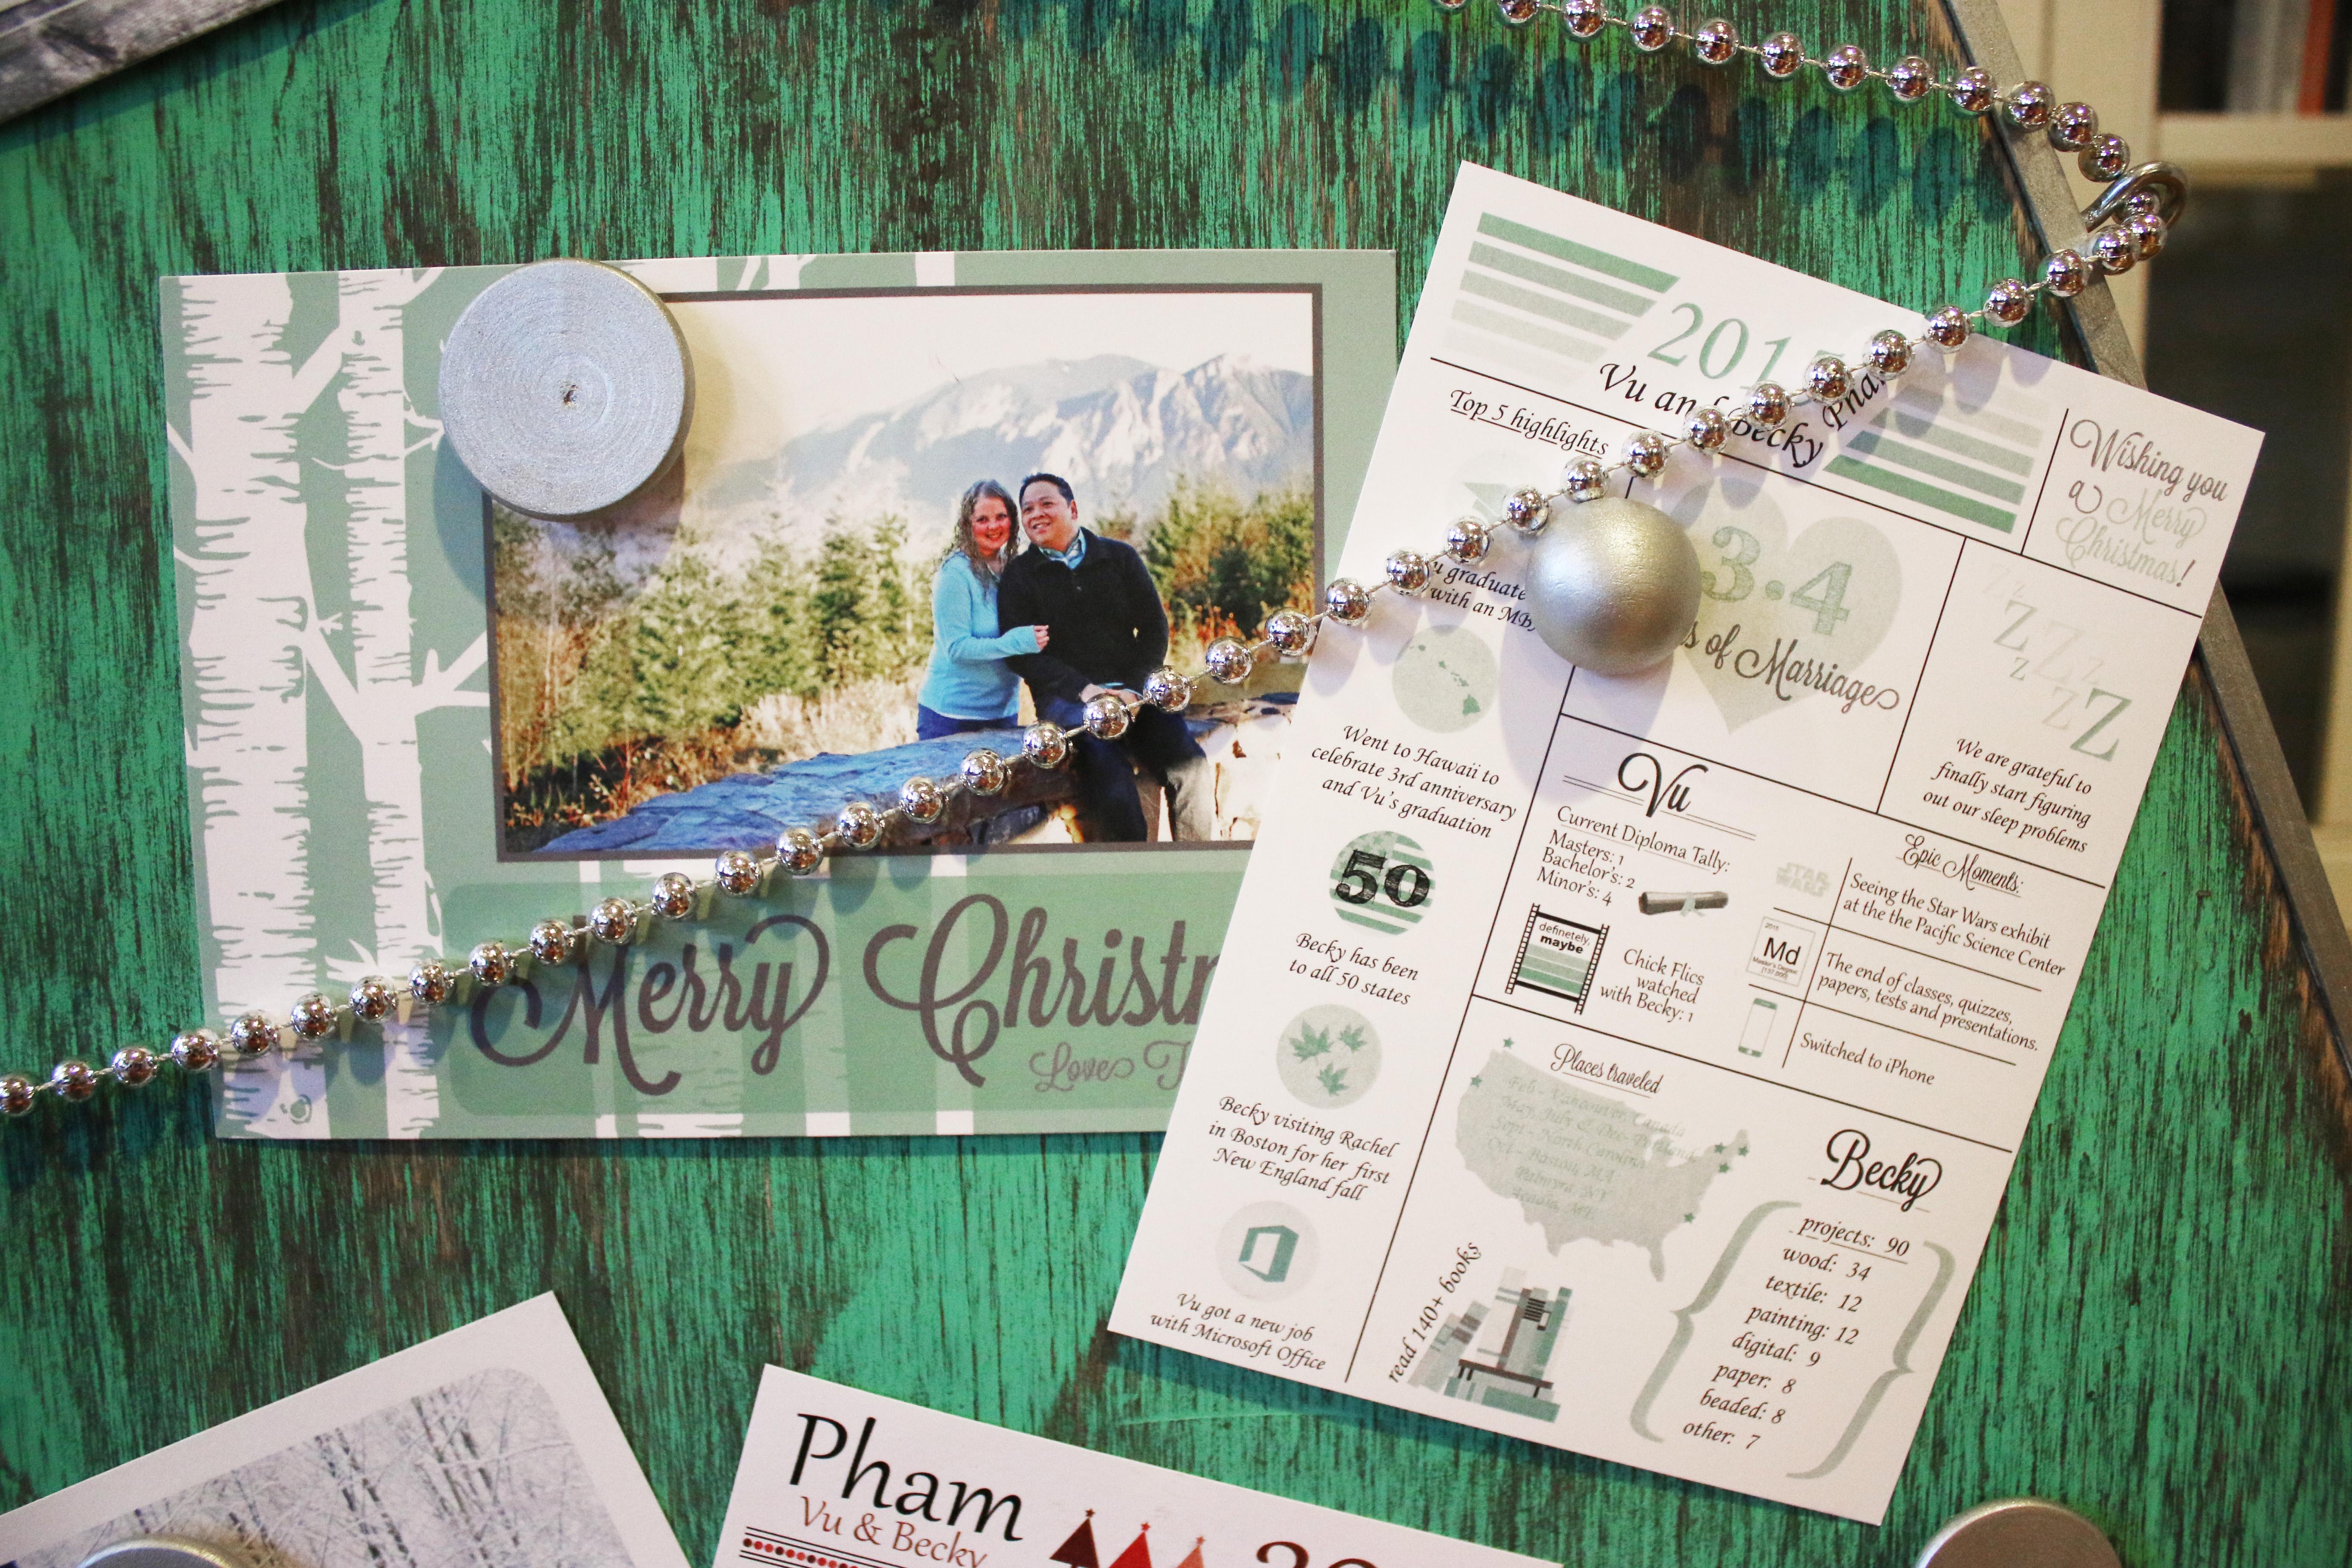 Christmas Cards 2017 | Becky Jael